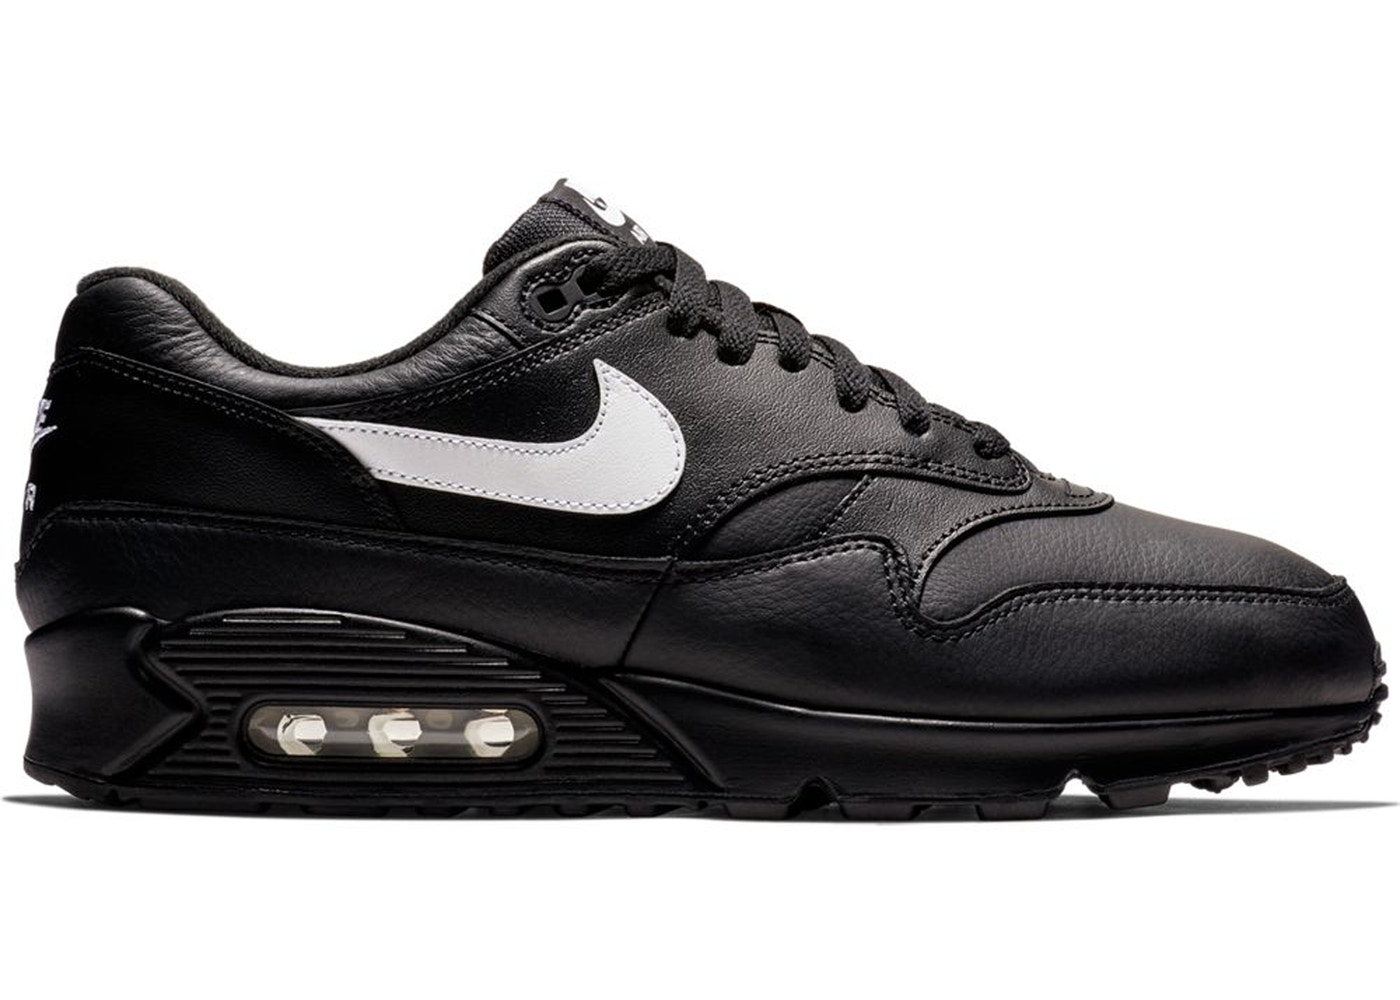 timeless design 0ea62 bdd03 On Sale: Nike Air Max 90/1